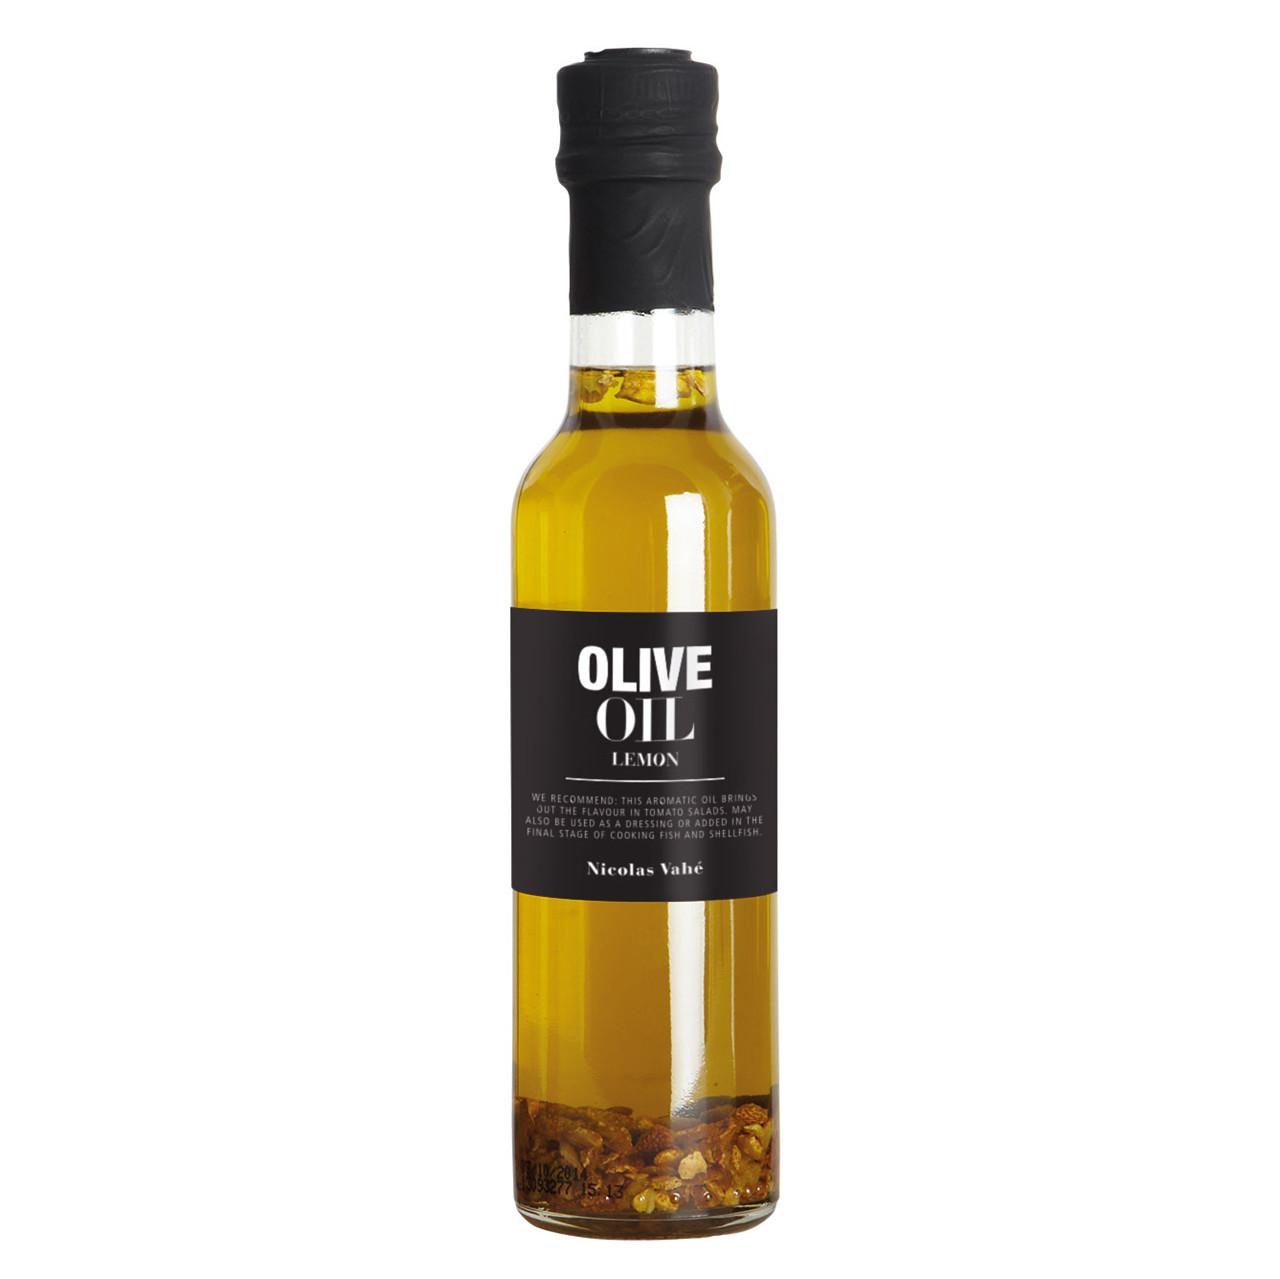 Nicolas vahé Nicolas vahé olivenolie med lemon fra livingshop